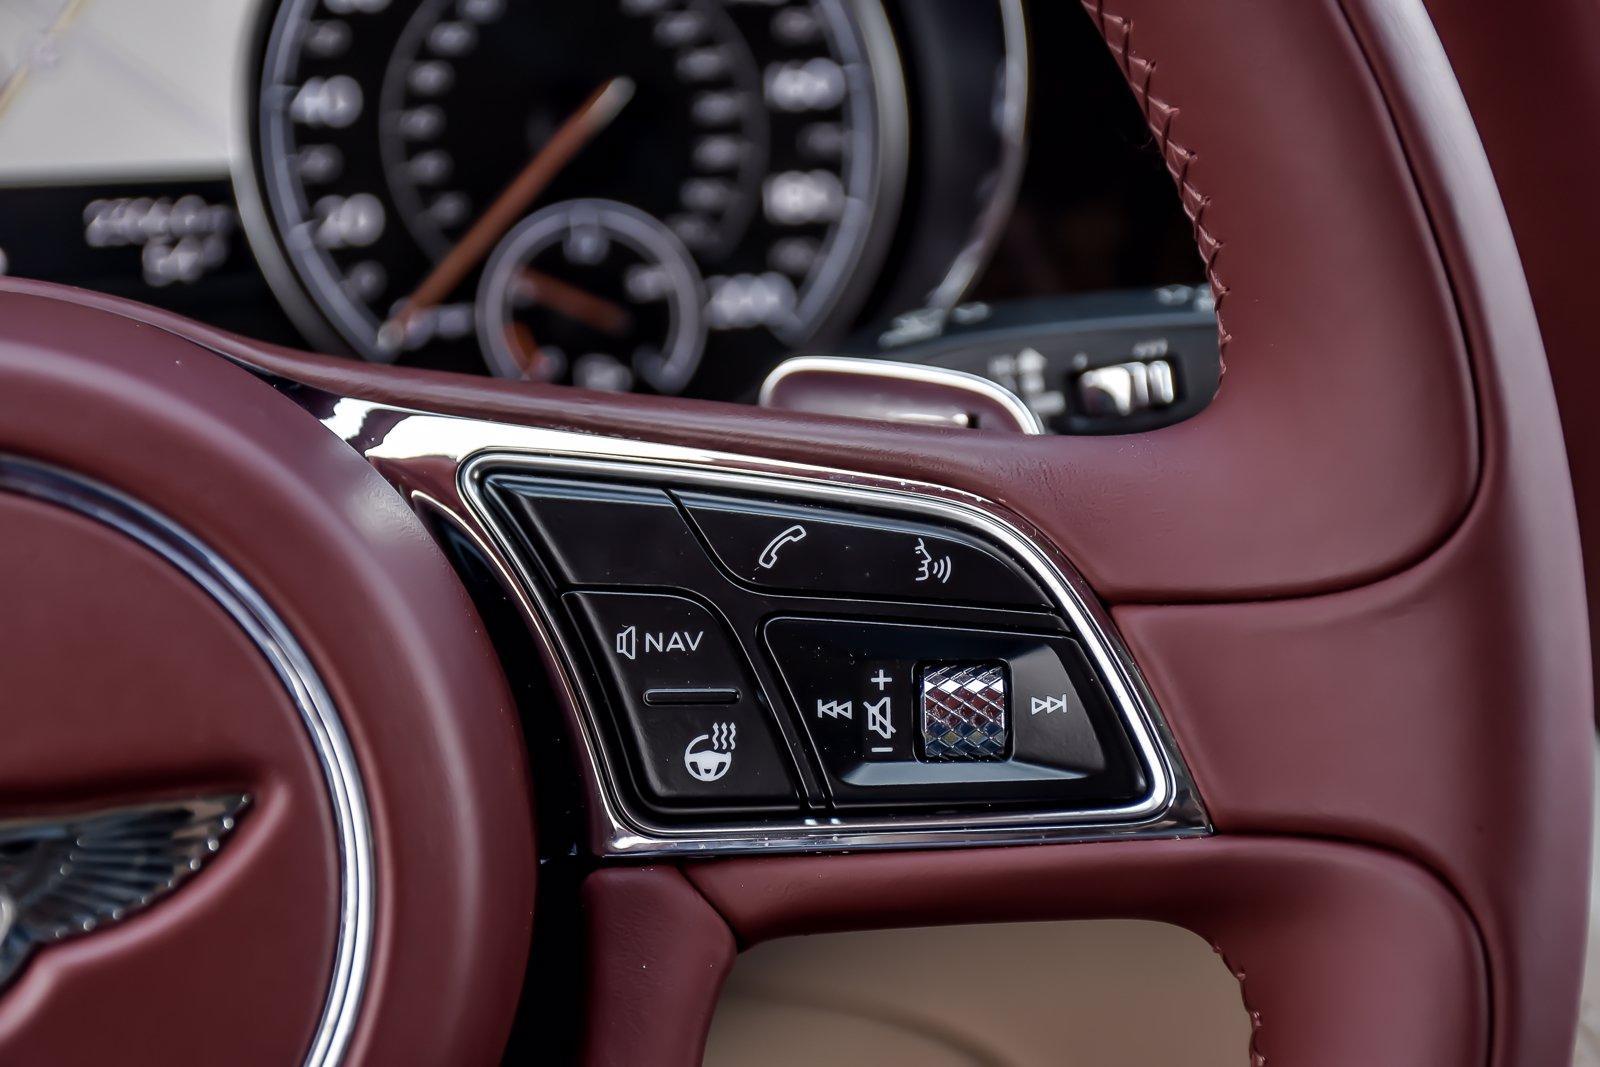 Used 2018 Bentley Bentayga Black Edition, Mulliner, Naim, | Downers Grove, IL